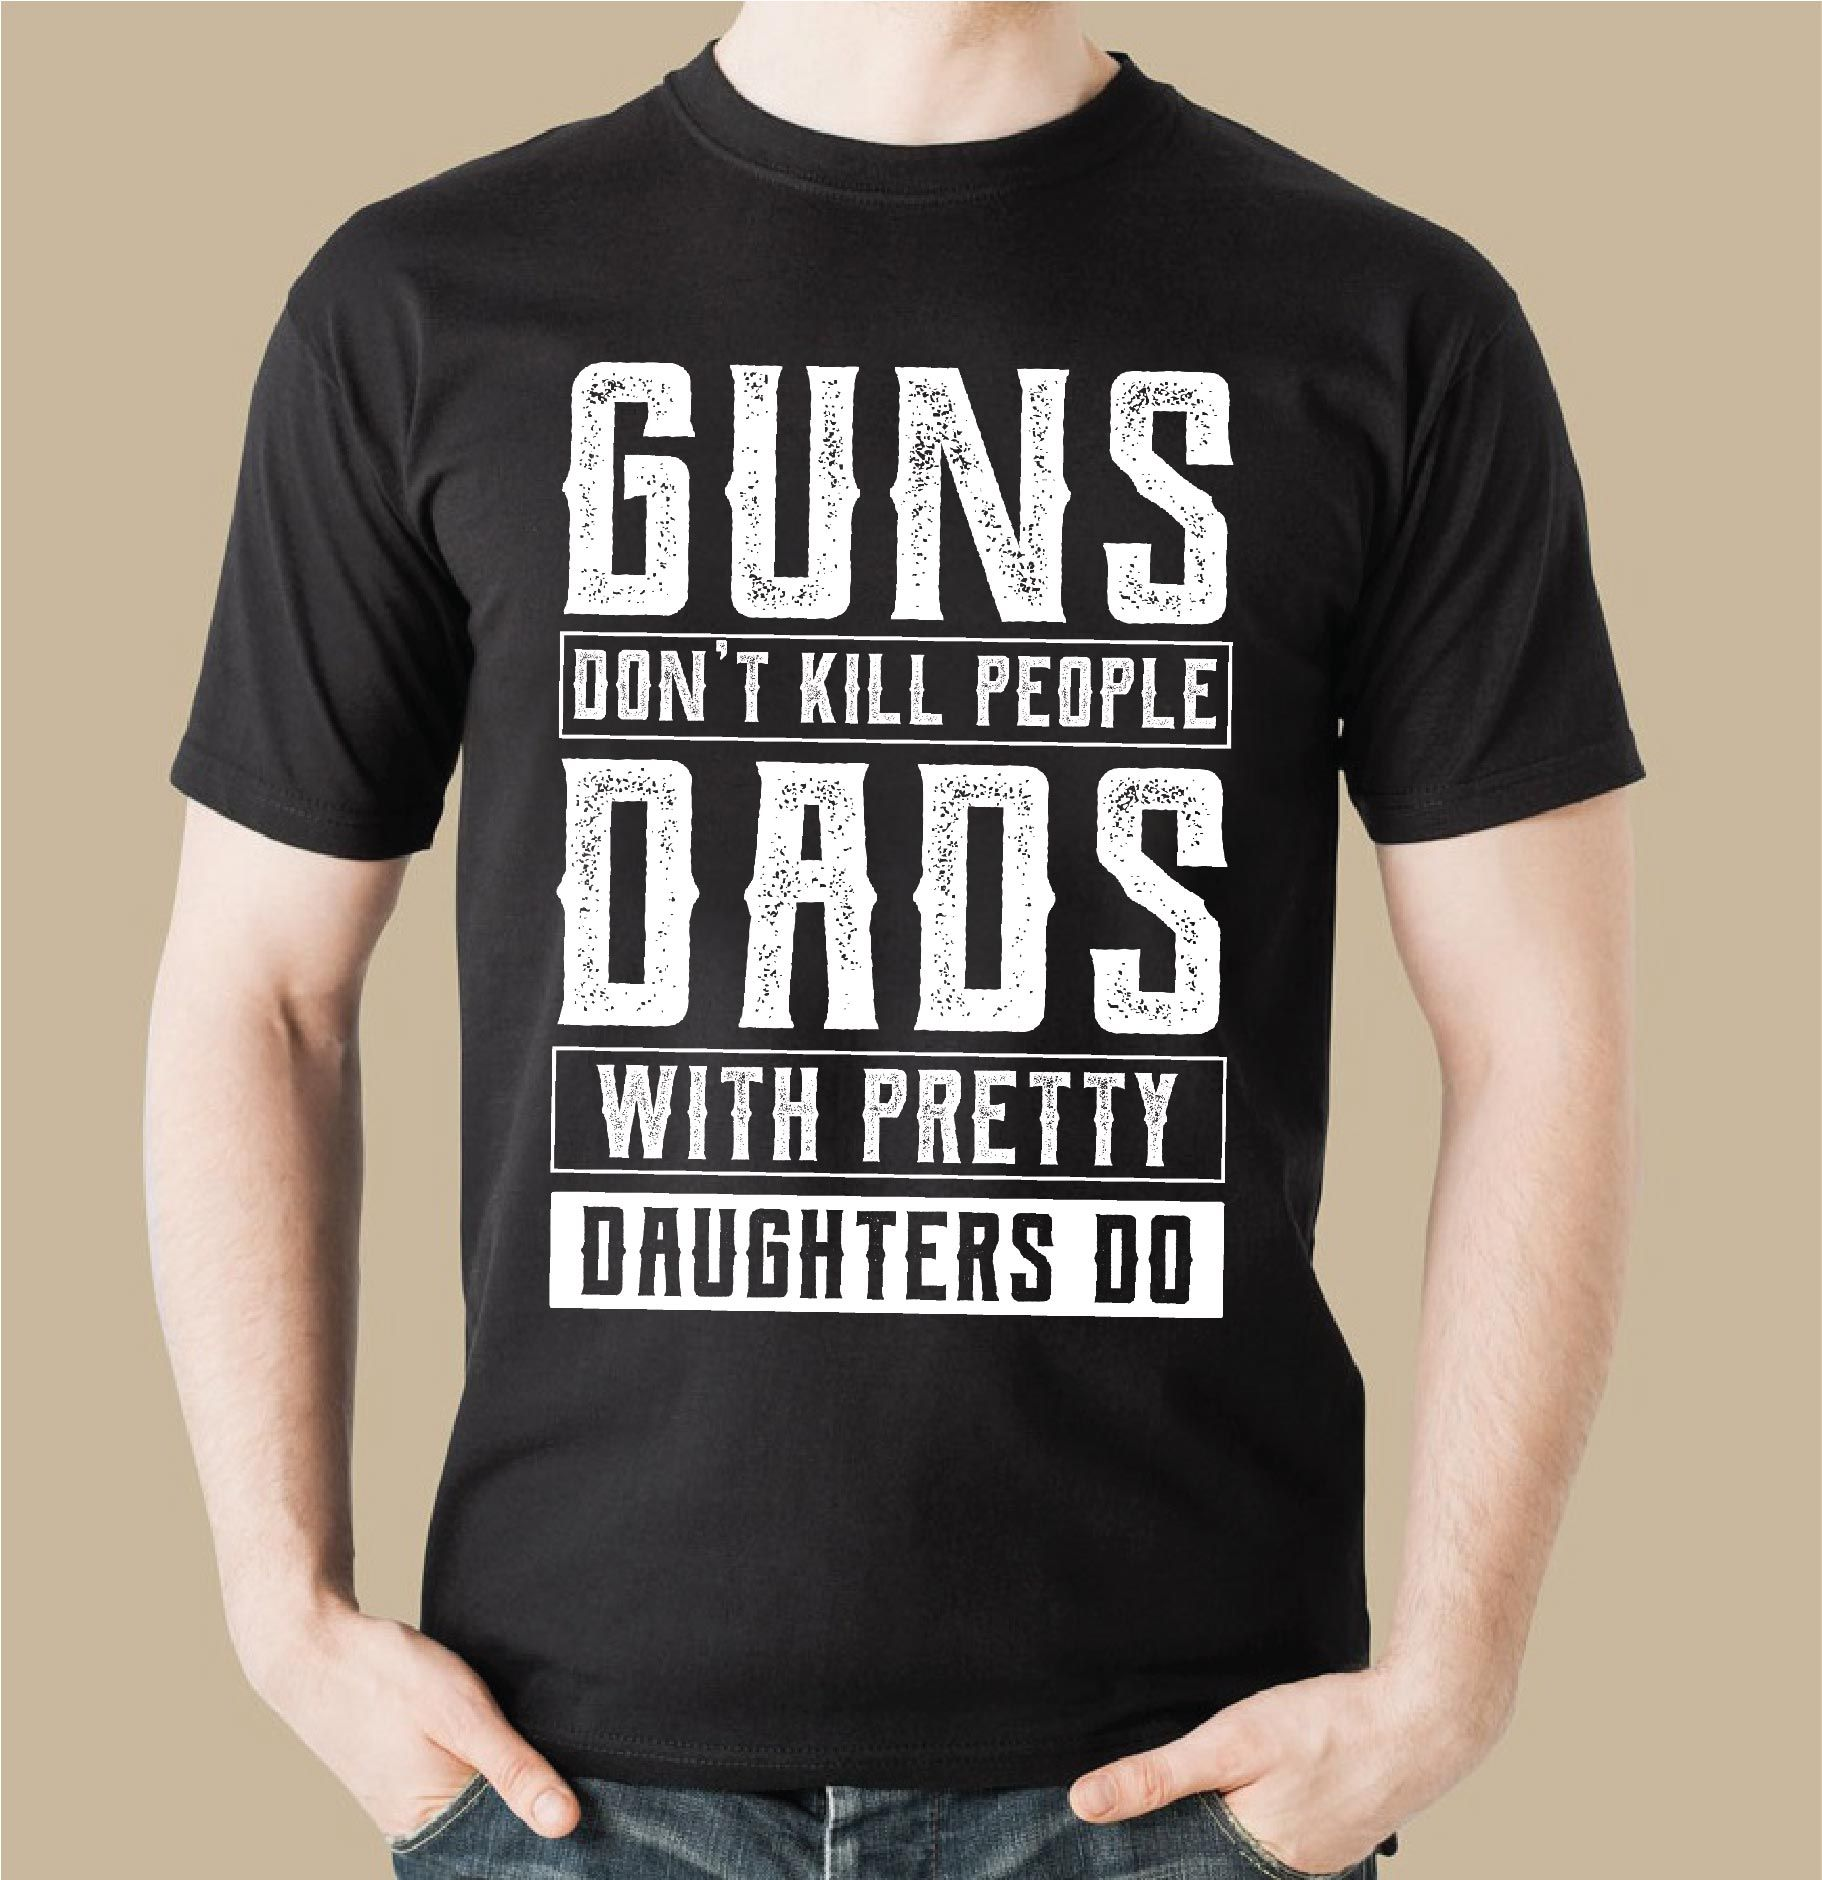 FATHER DAUGHTER T-SHIRT HUMOR FUNNY BOYFRIEND GIRLFRIEND